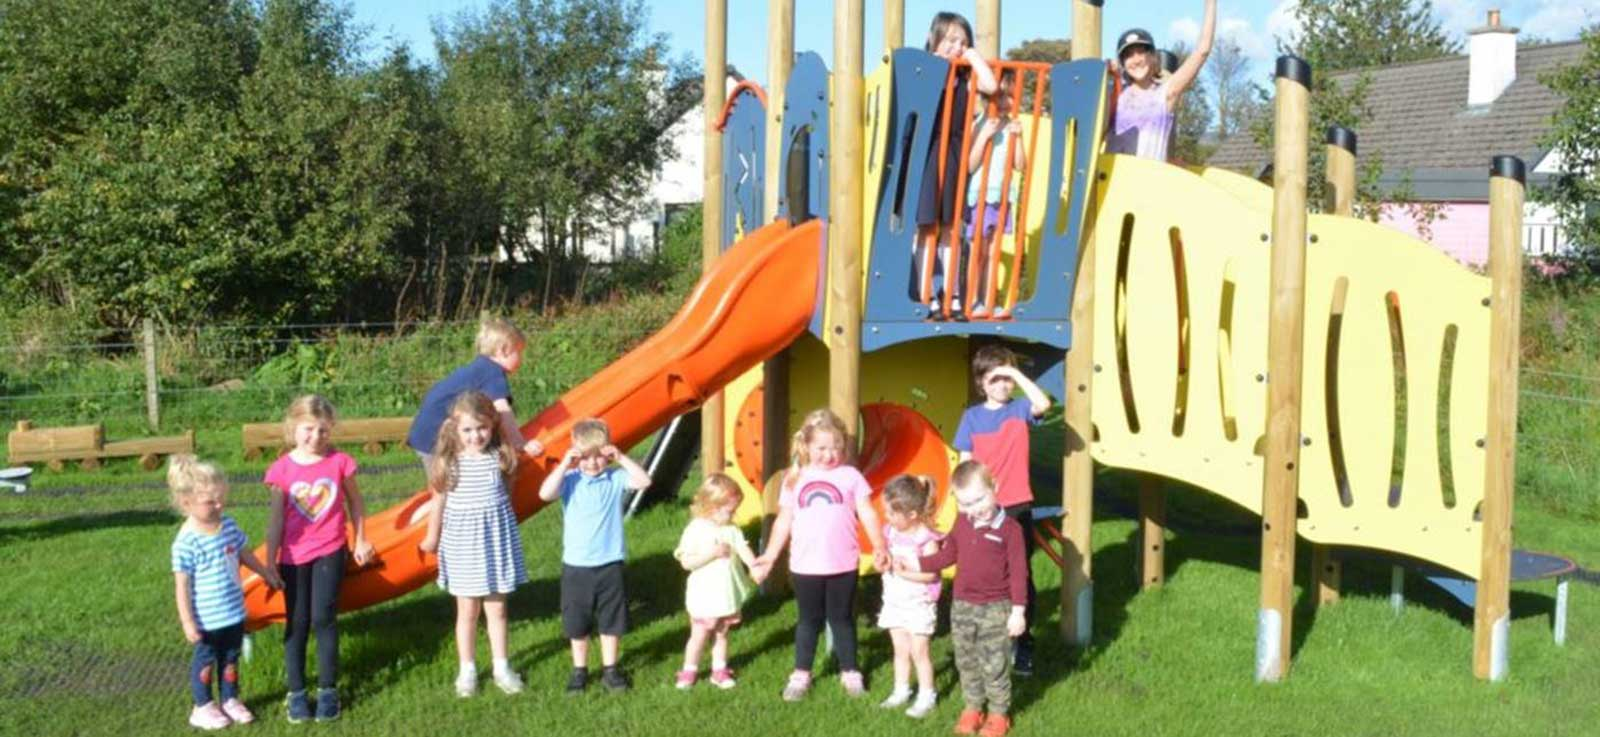 Appin community playpark